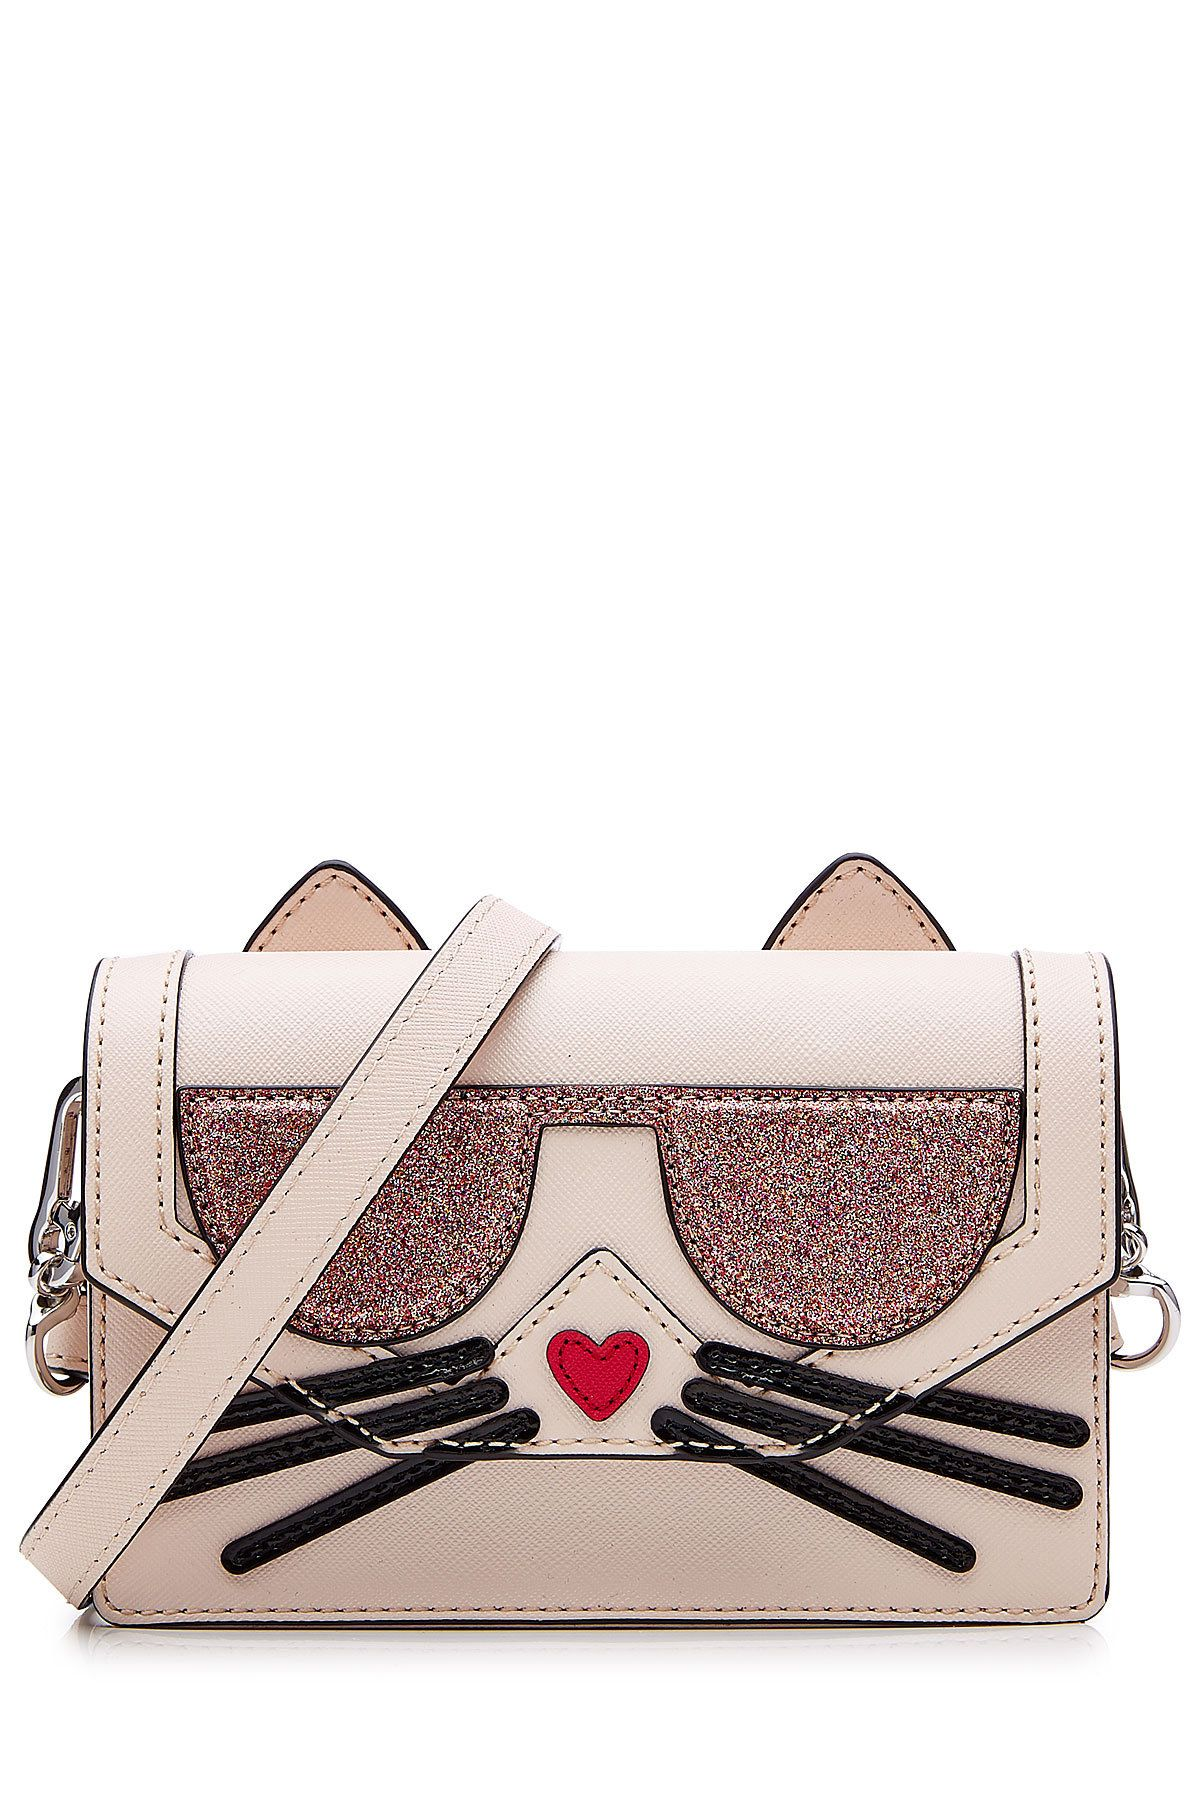 Kcocktail Cat Crossbody Bag Karl Lagerfeld Women Us Stylebop